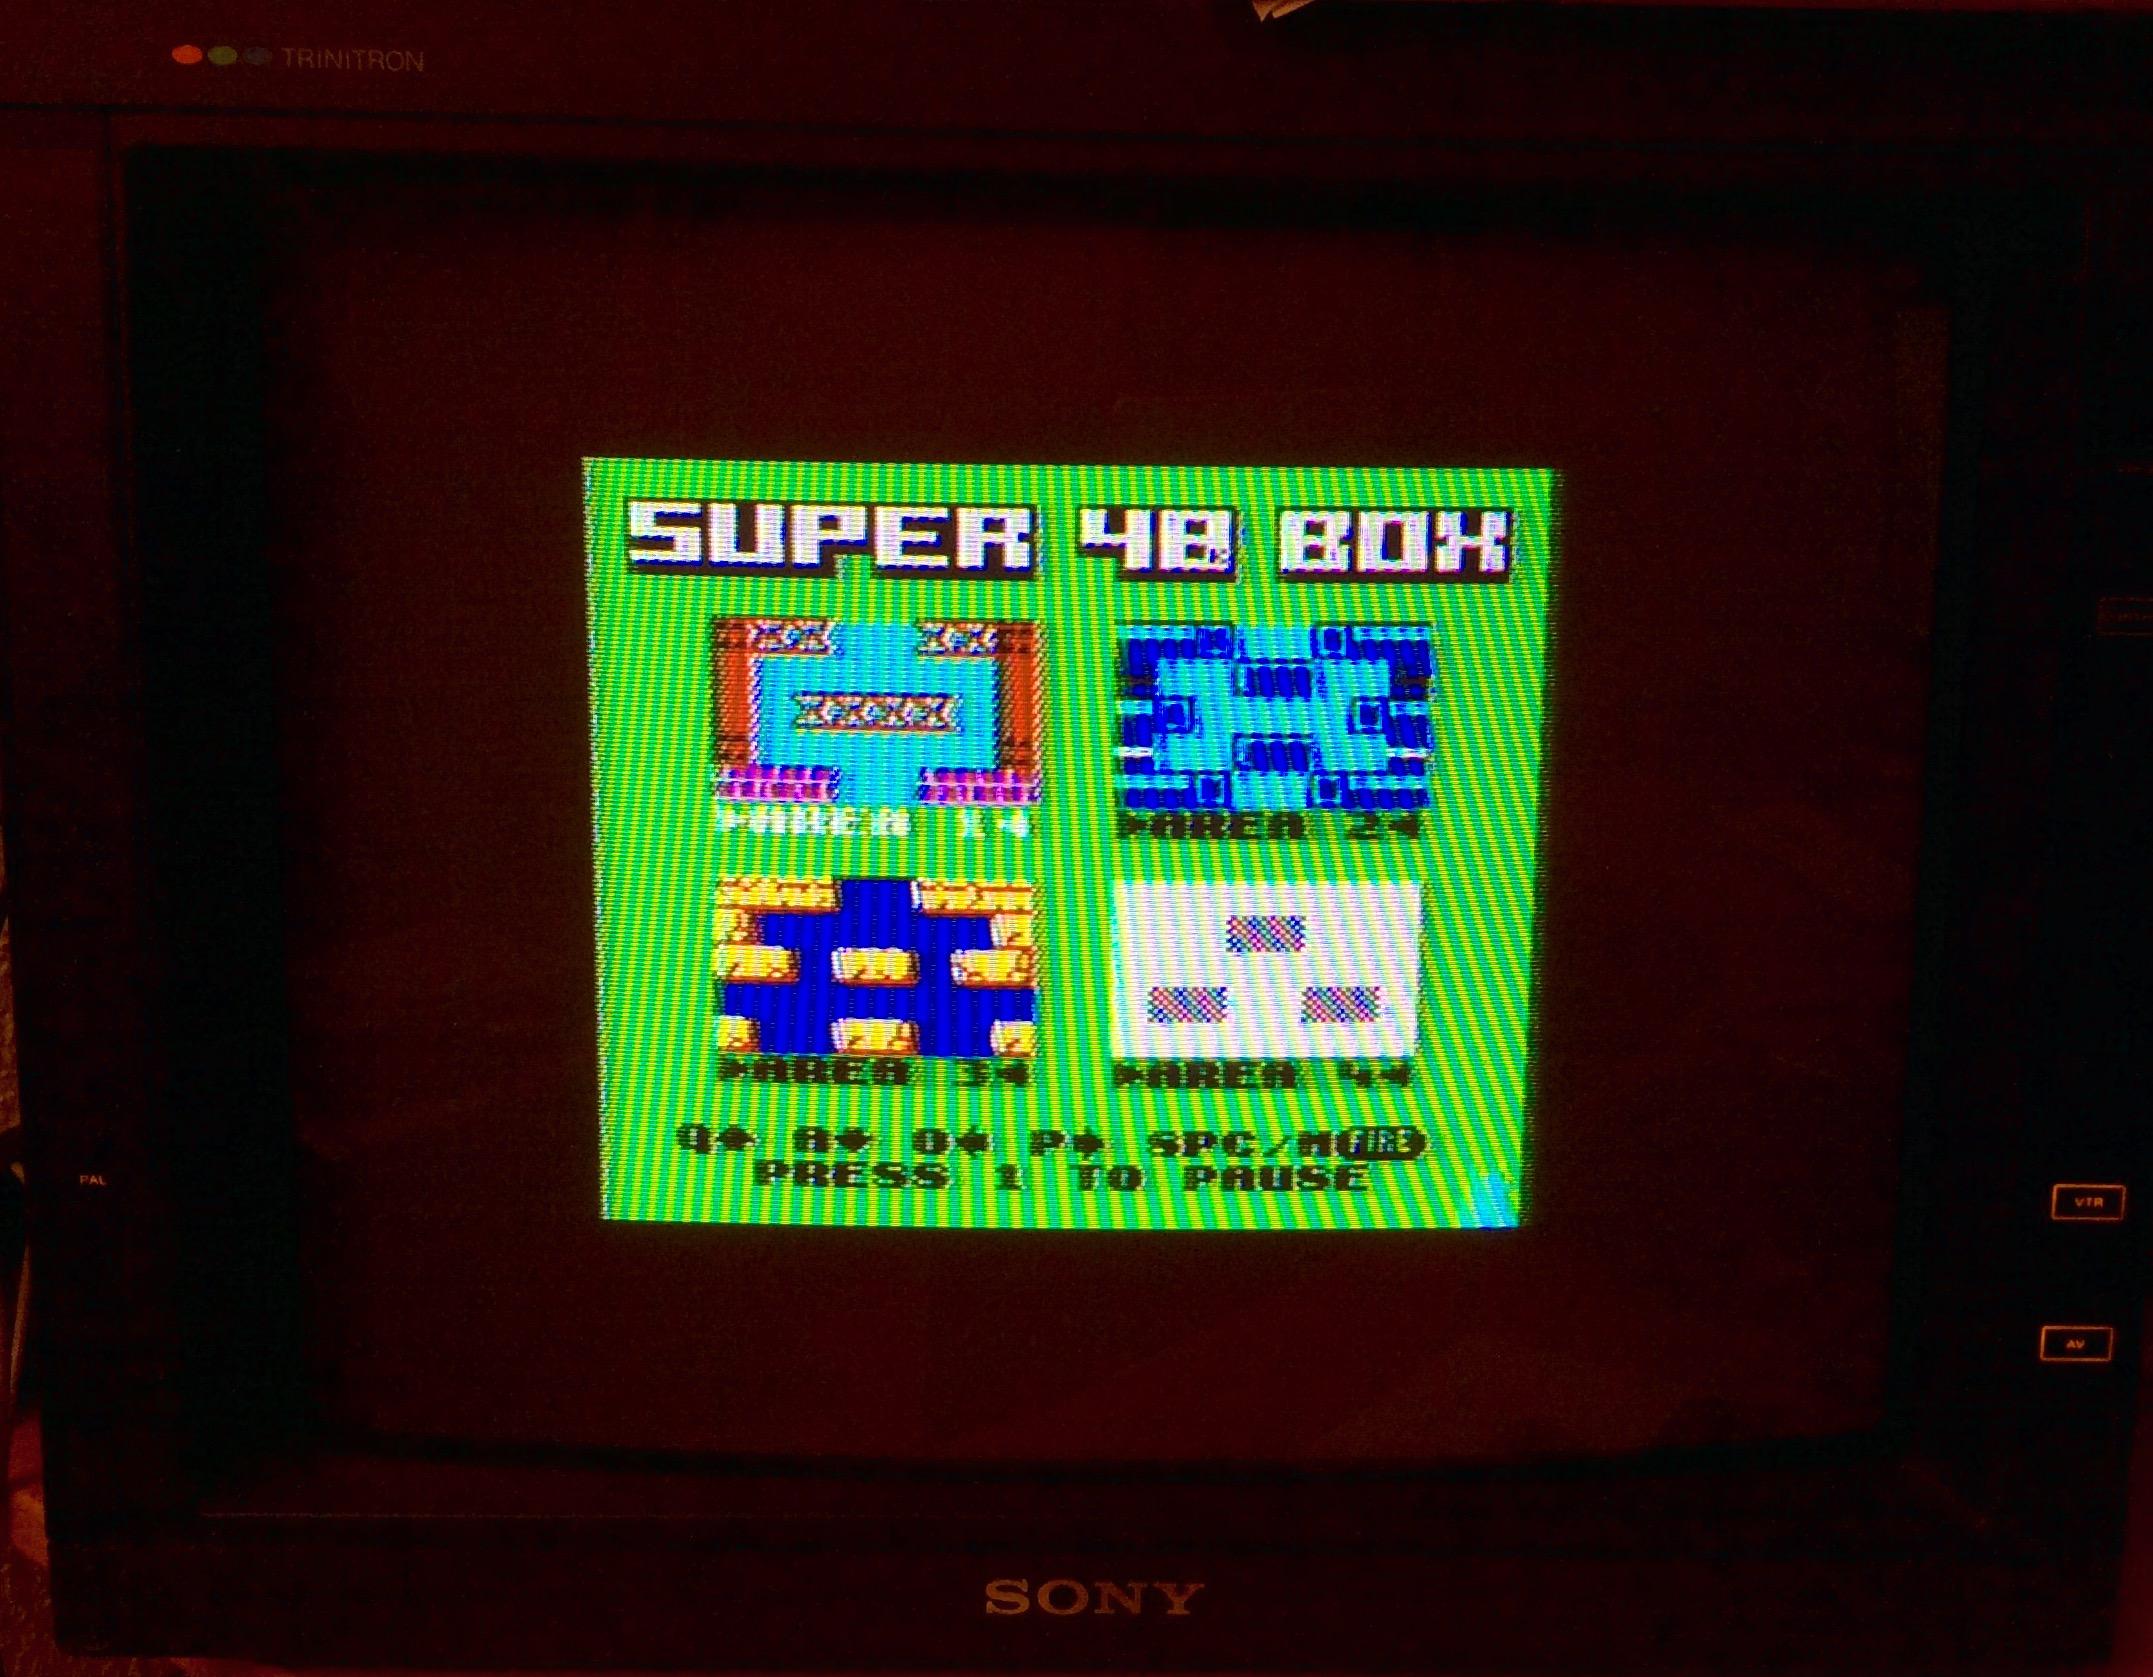 SHiNjide: Super 48k Box [Area 3] (ZX Spectrum) 11 points on 2015-05-30 16:35:32